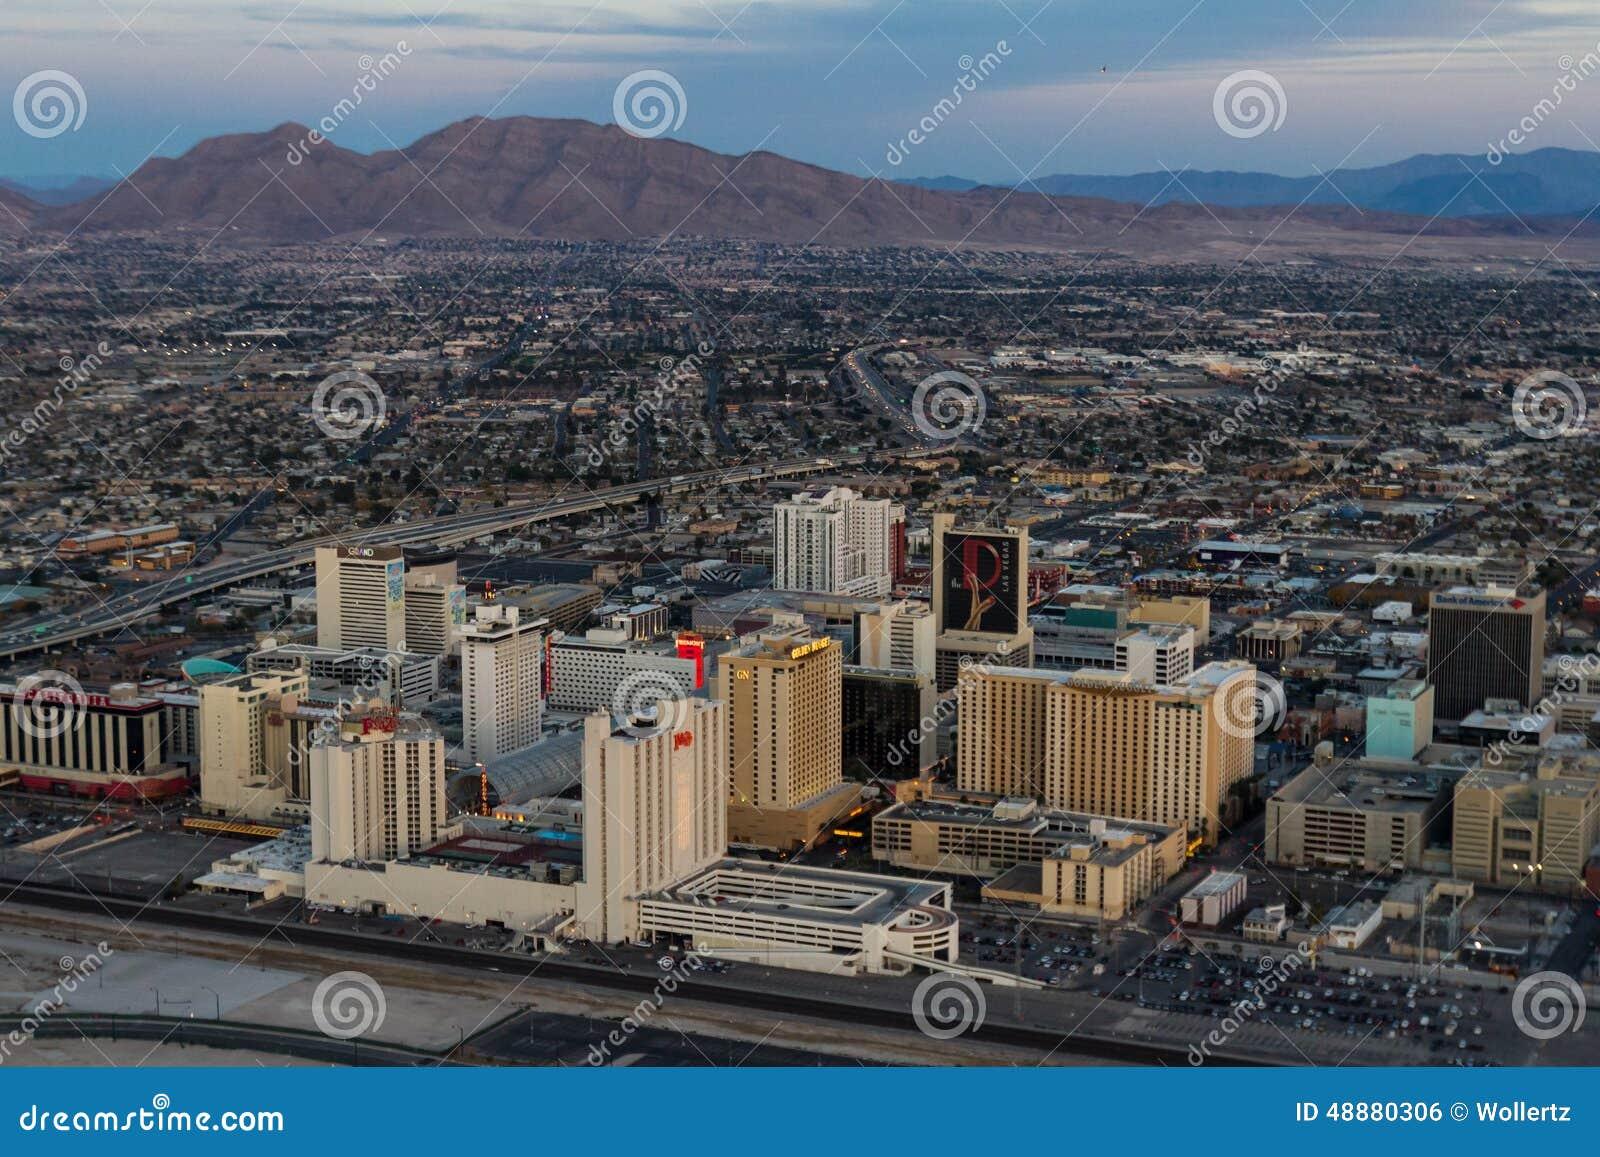 ... downtown North Las Vegas, December 14 2014 in North Las Vegas, Nevada